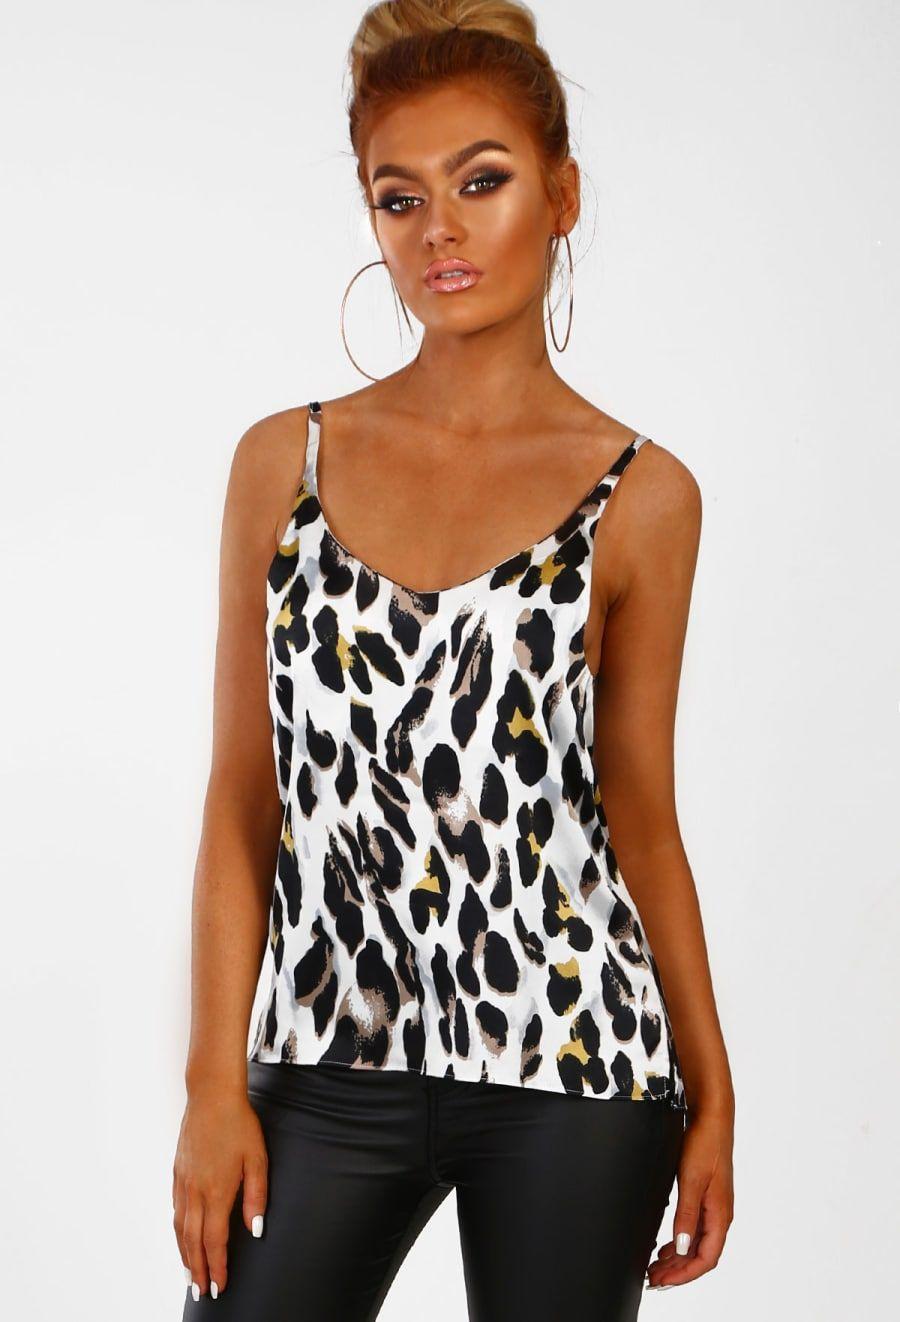 c0998c6e6bdb In The Wild White Leopard Print Cami Top - 6 | NEW IN at PB ...